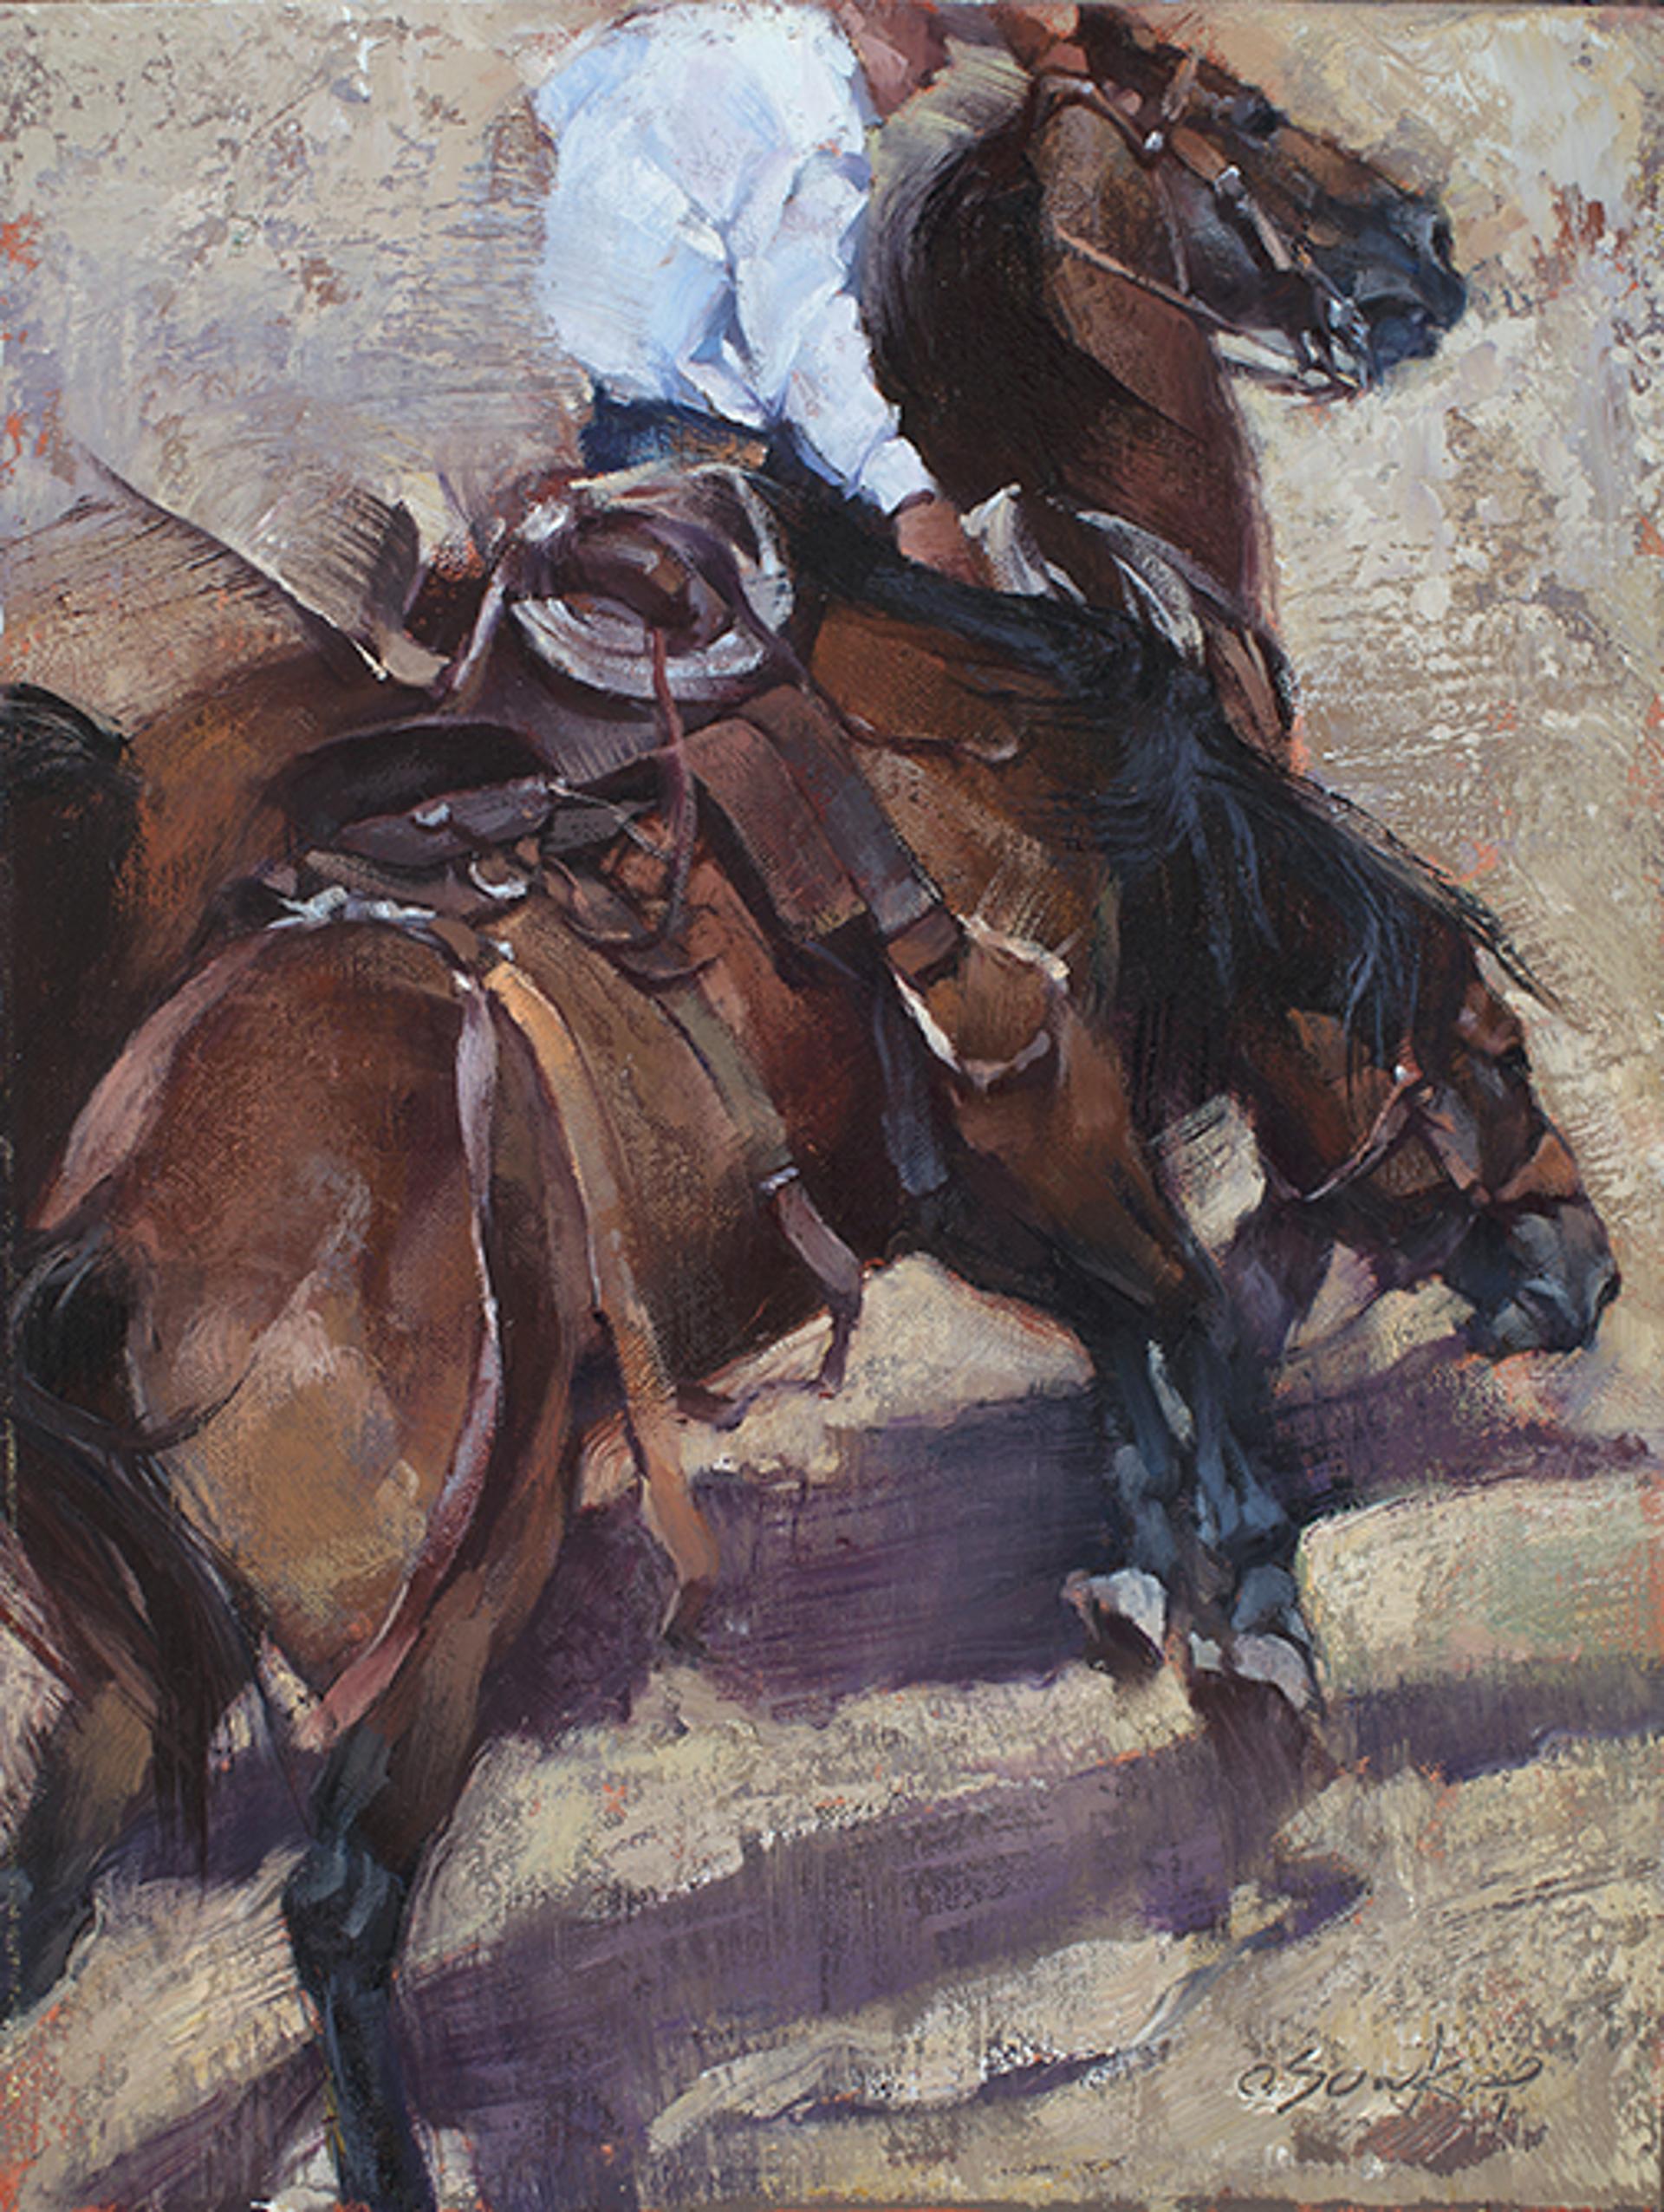 Bucking Bay (Fairgrounds Bronco 1) by Jill Soukup